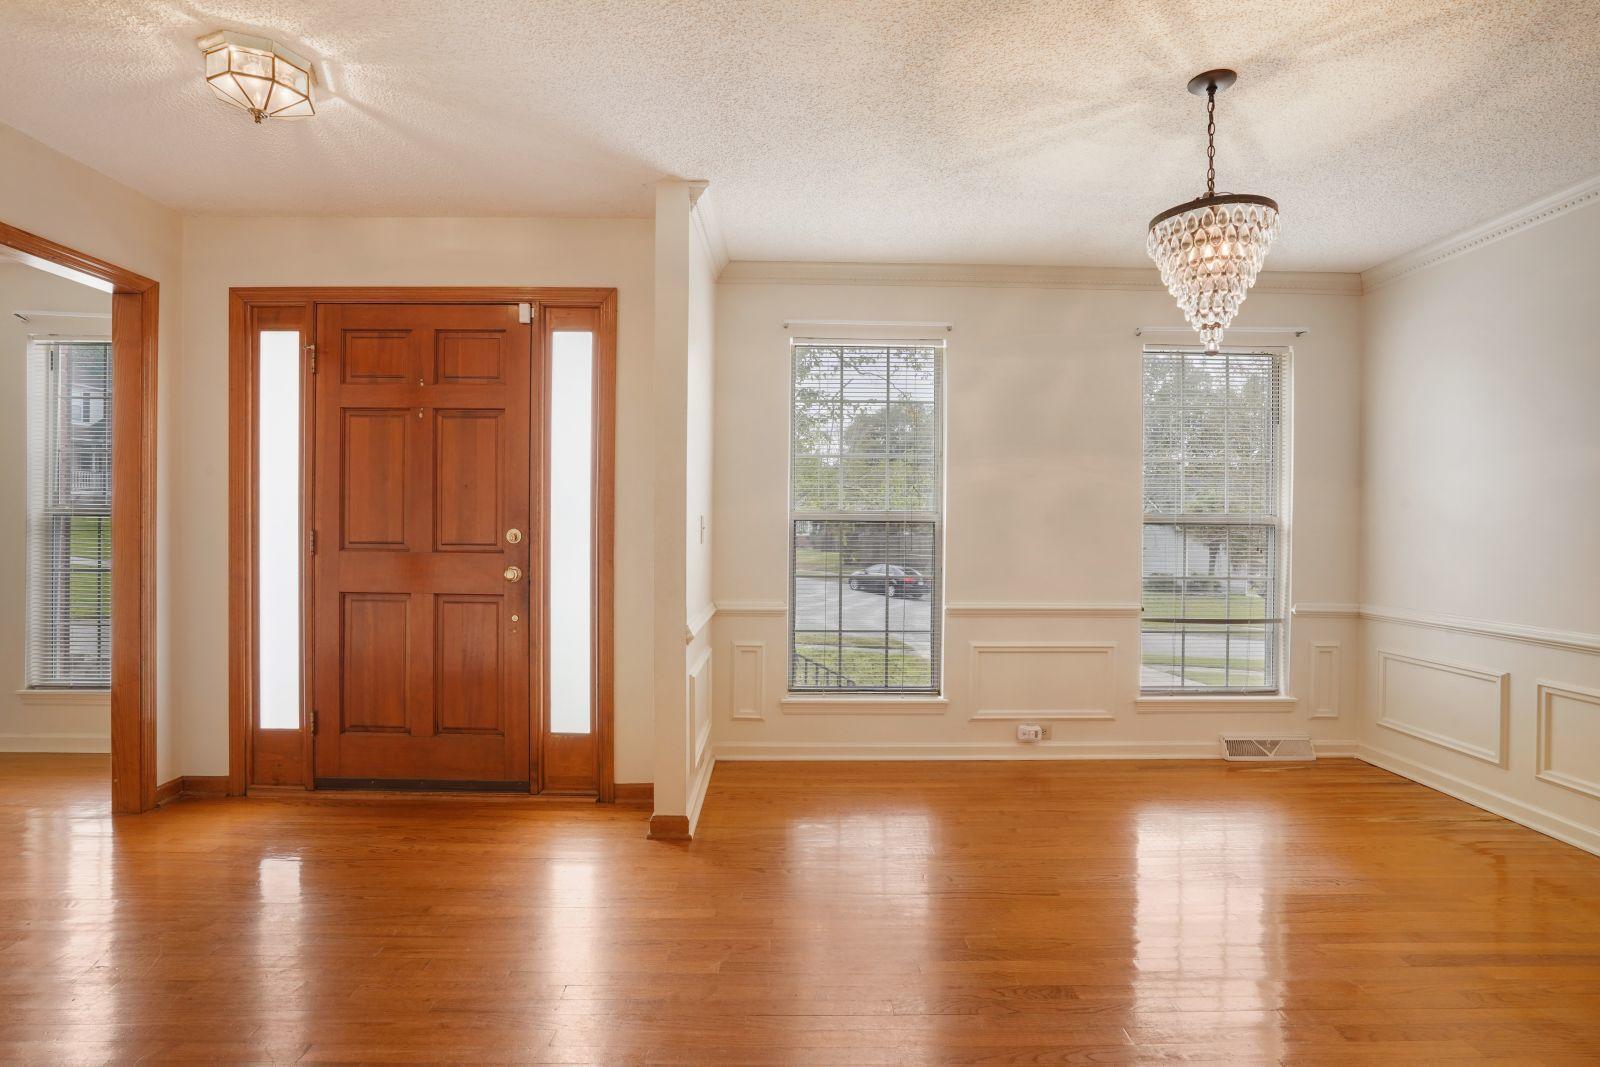 Crowfield Plantation Homes For Sale - 161 Belleplaine, Goose Creek, SC - 36